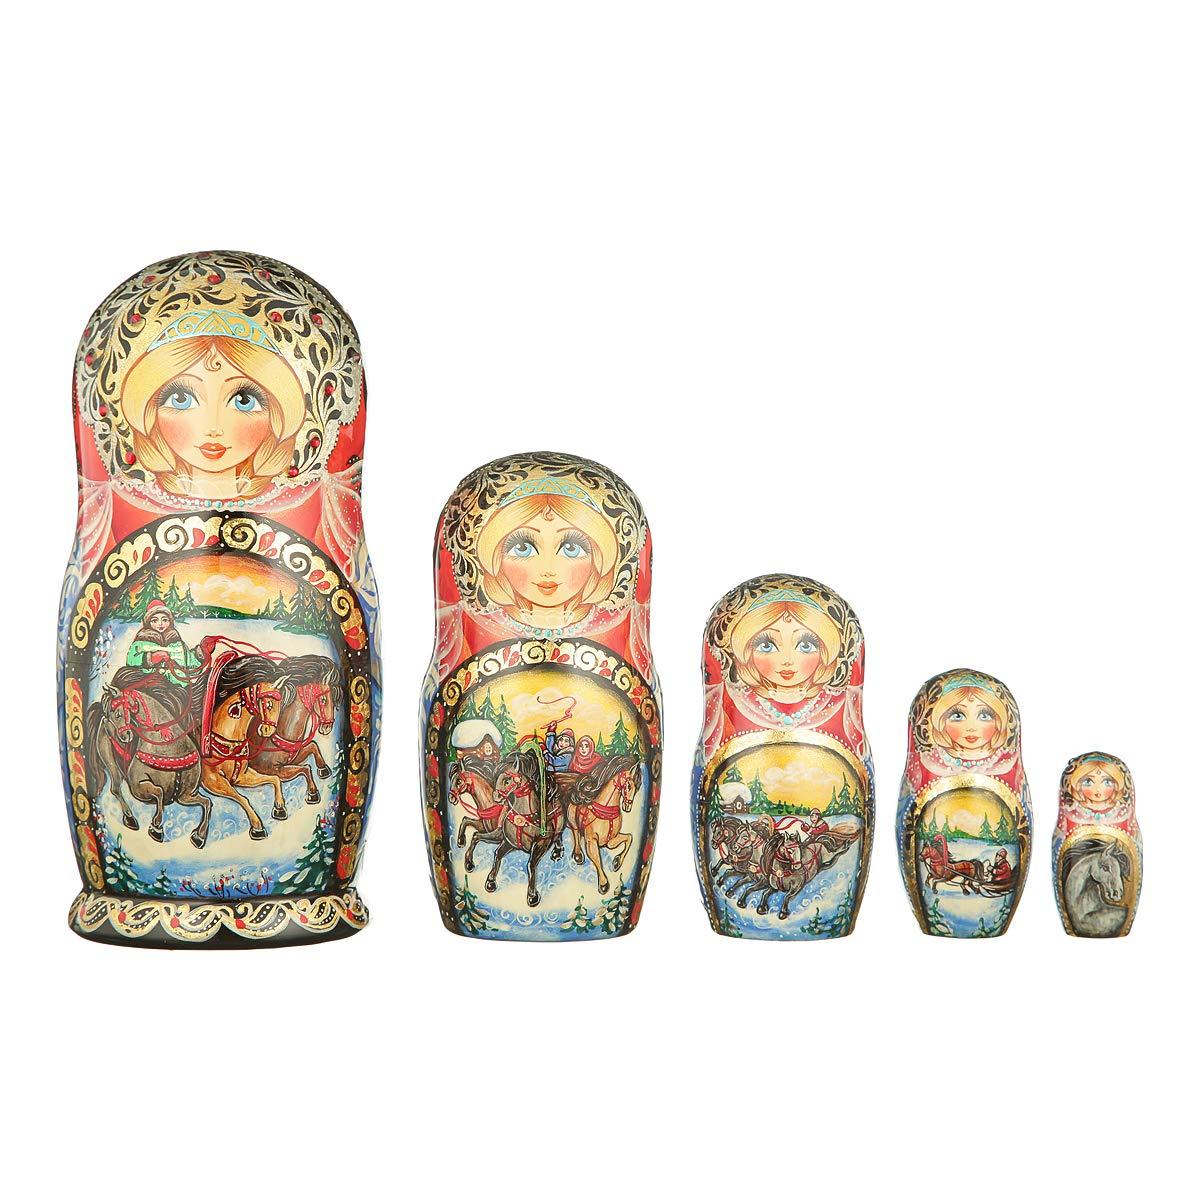 danila-souvenirs Russian Wooden Nesting Dolls Hand Painted Matryoshka 5 pcs Set Winter Troika 7.5'' by danila-souvenirs (Image #1)